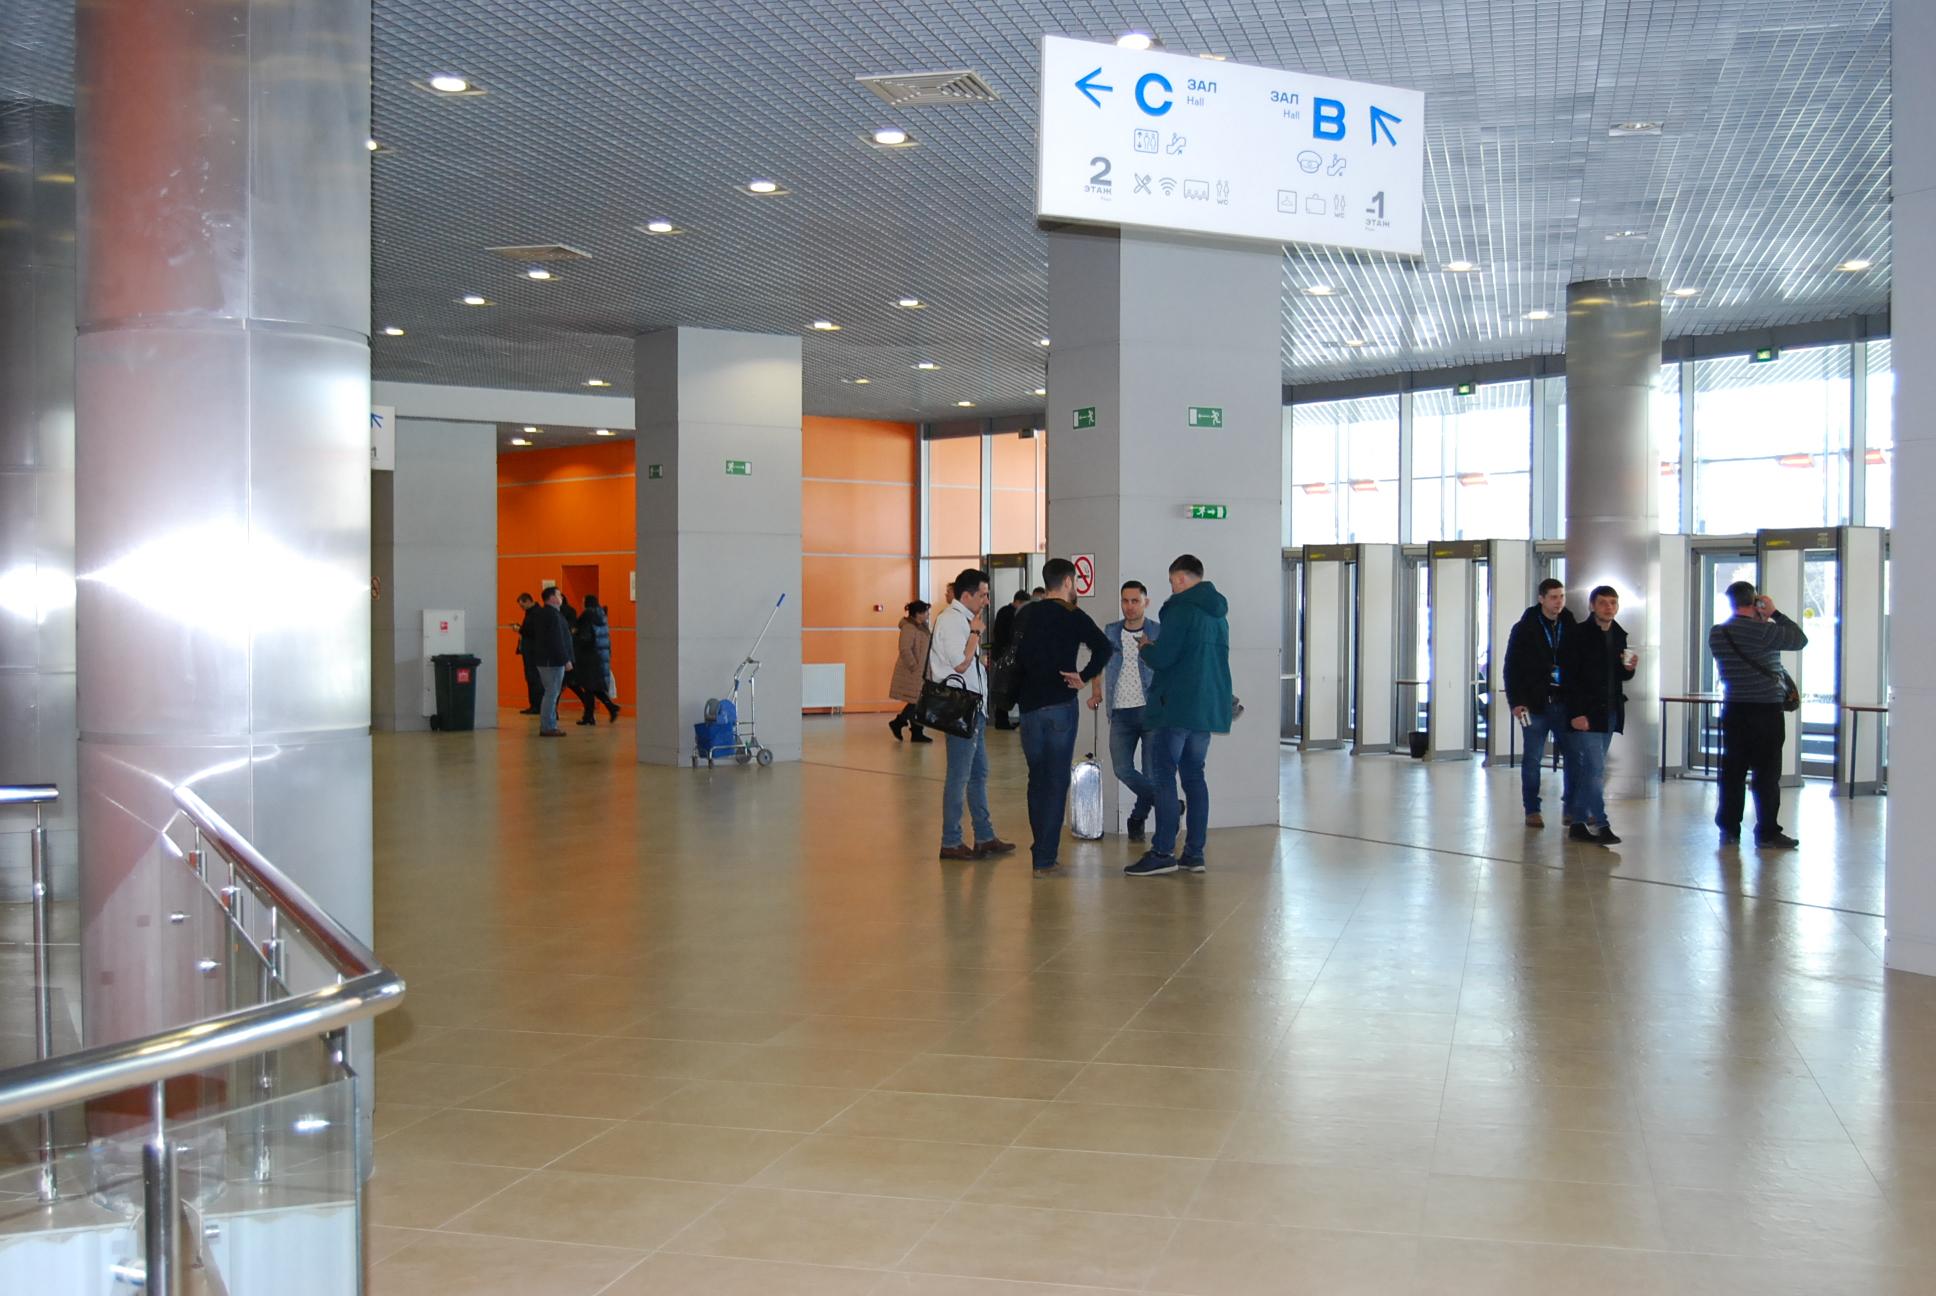 VendExpo 2018. Вход в павильон изнутри от 02.04.2018 9:15:00